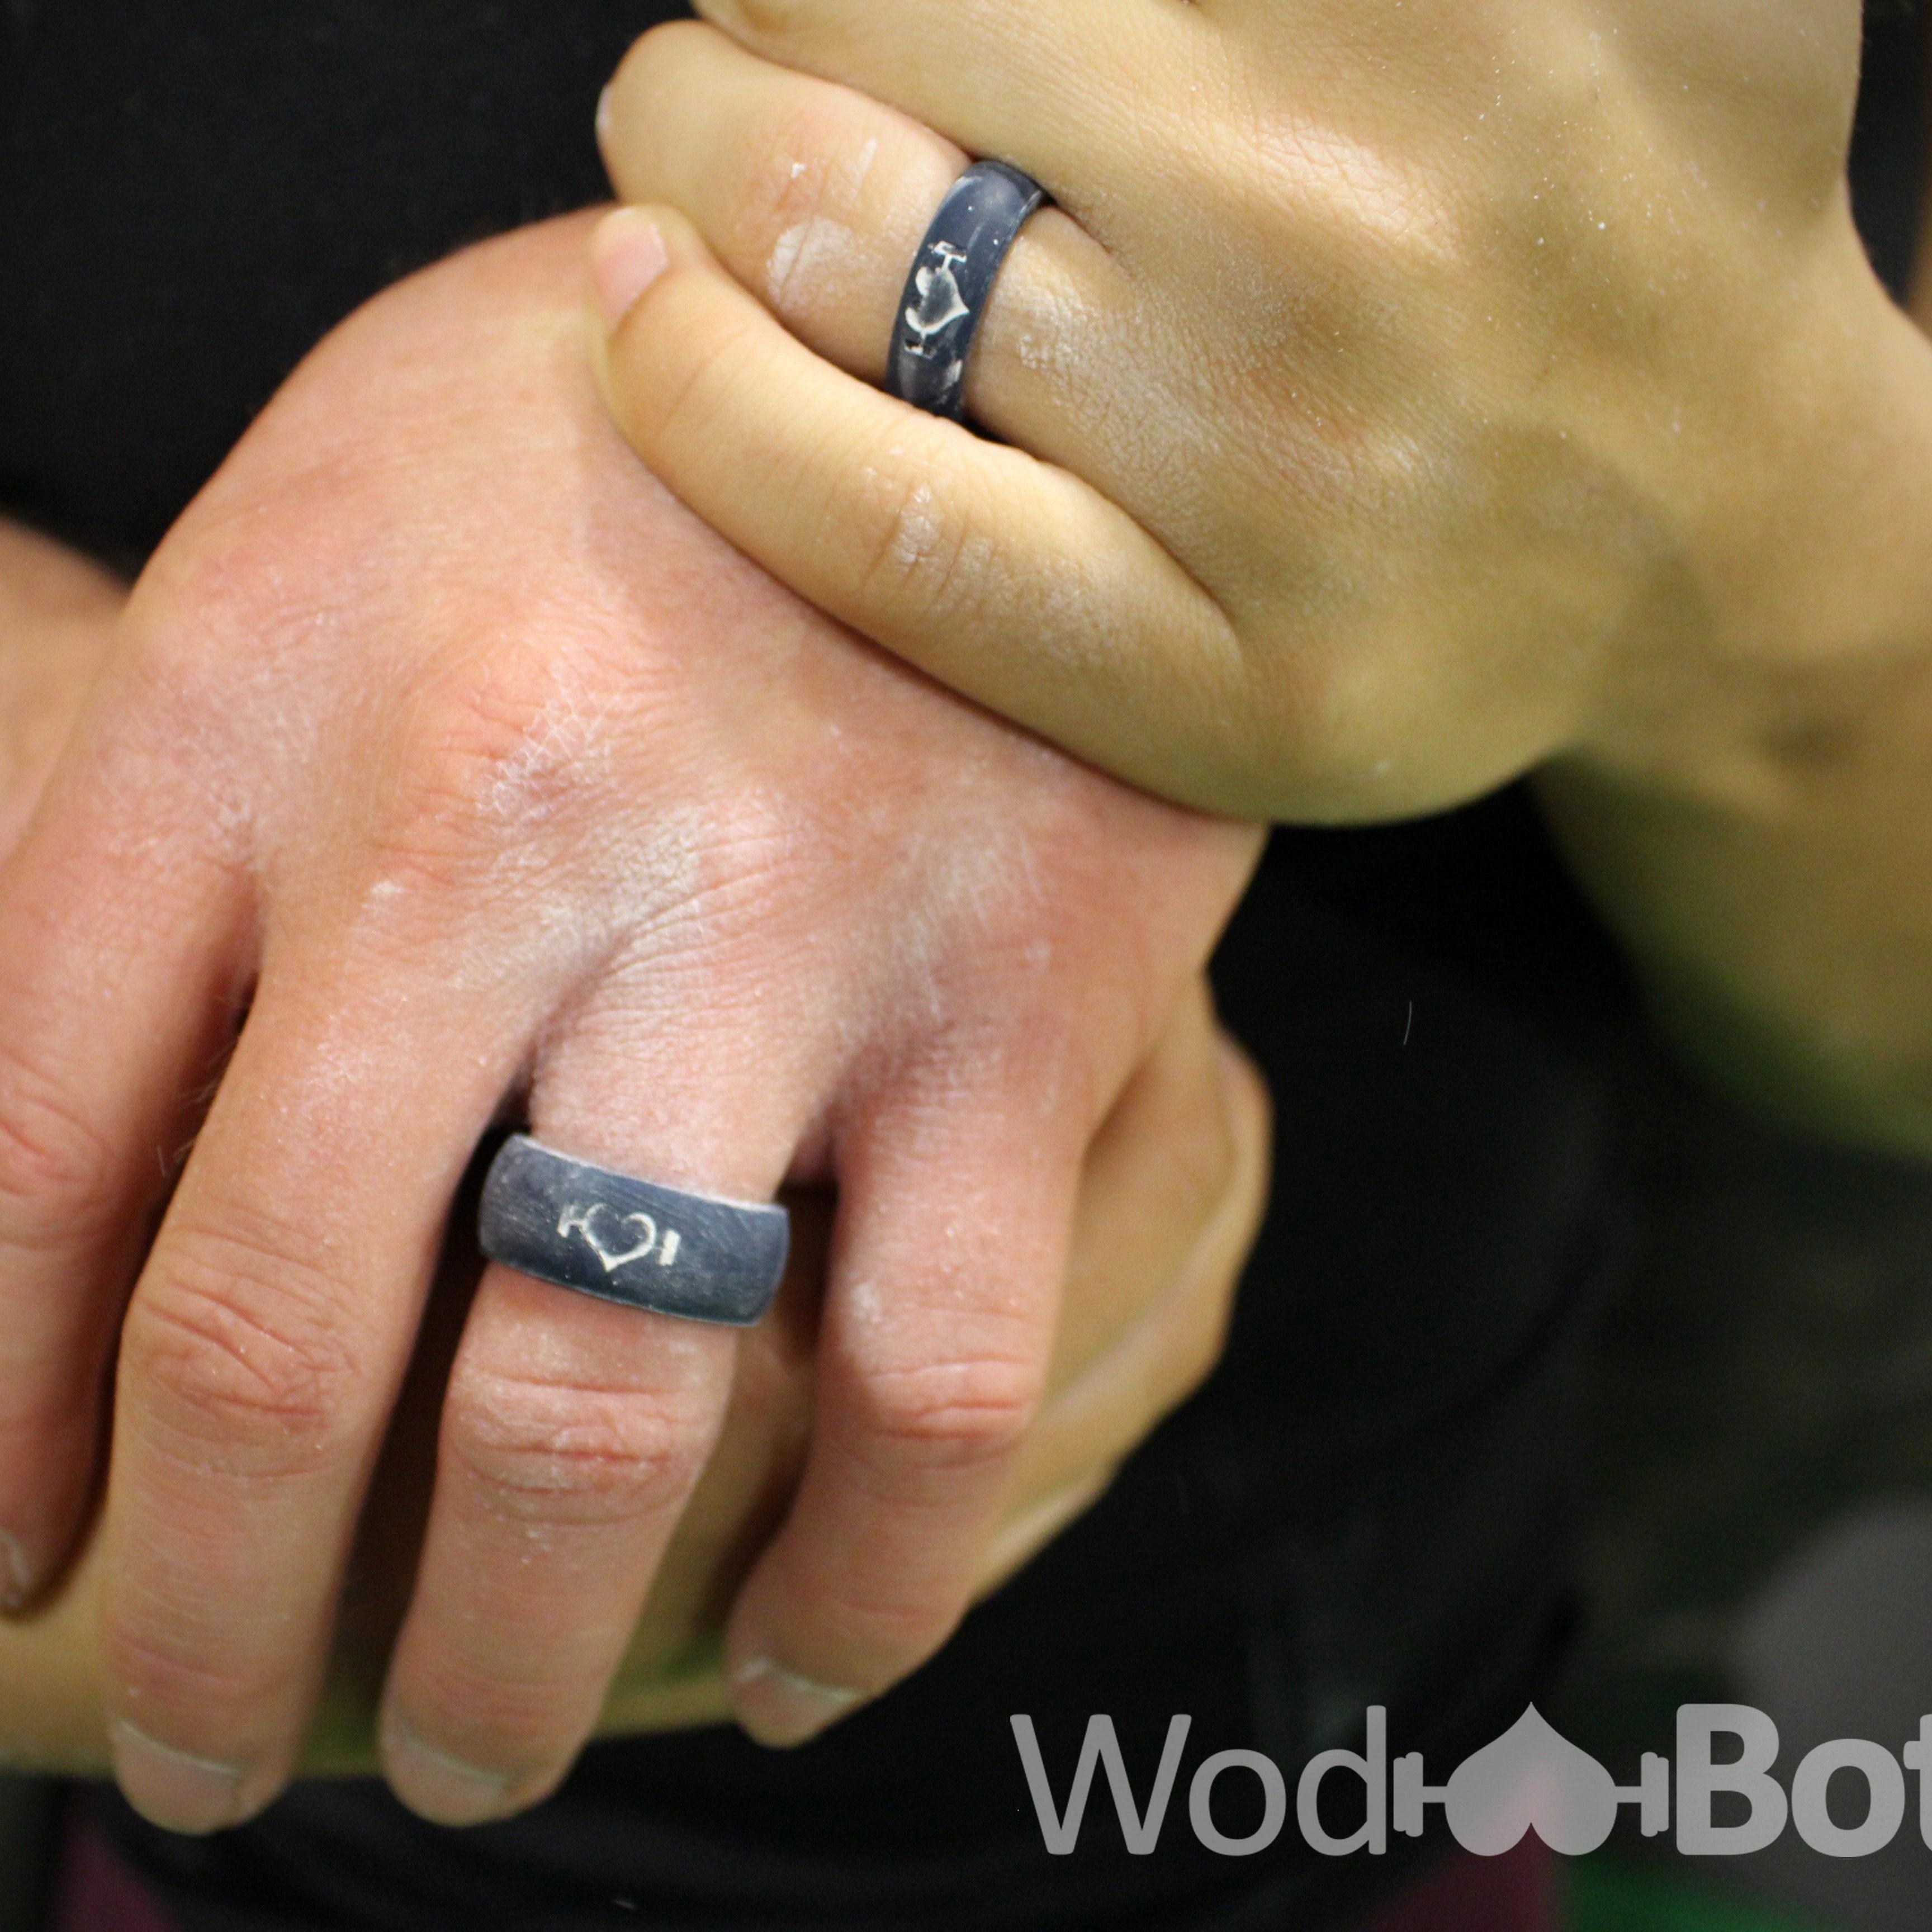 WodBottom mens rubber wedding bands